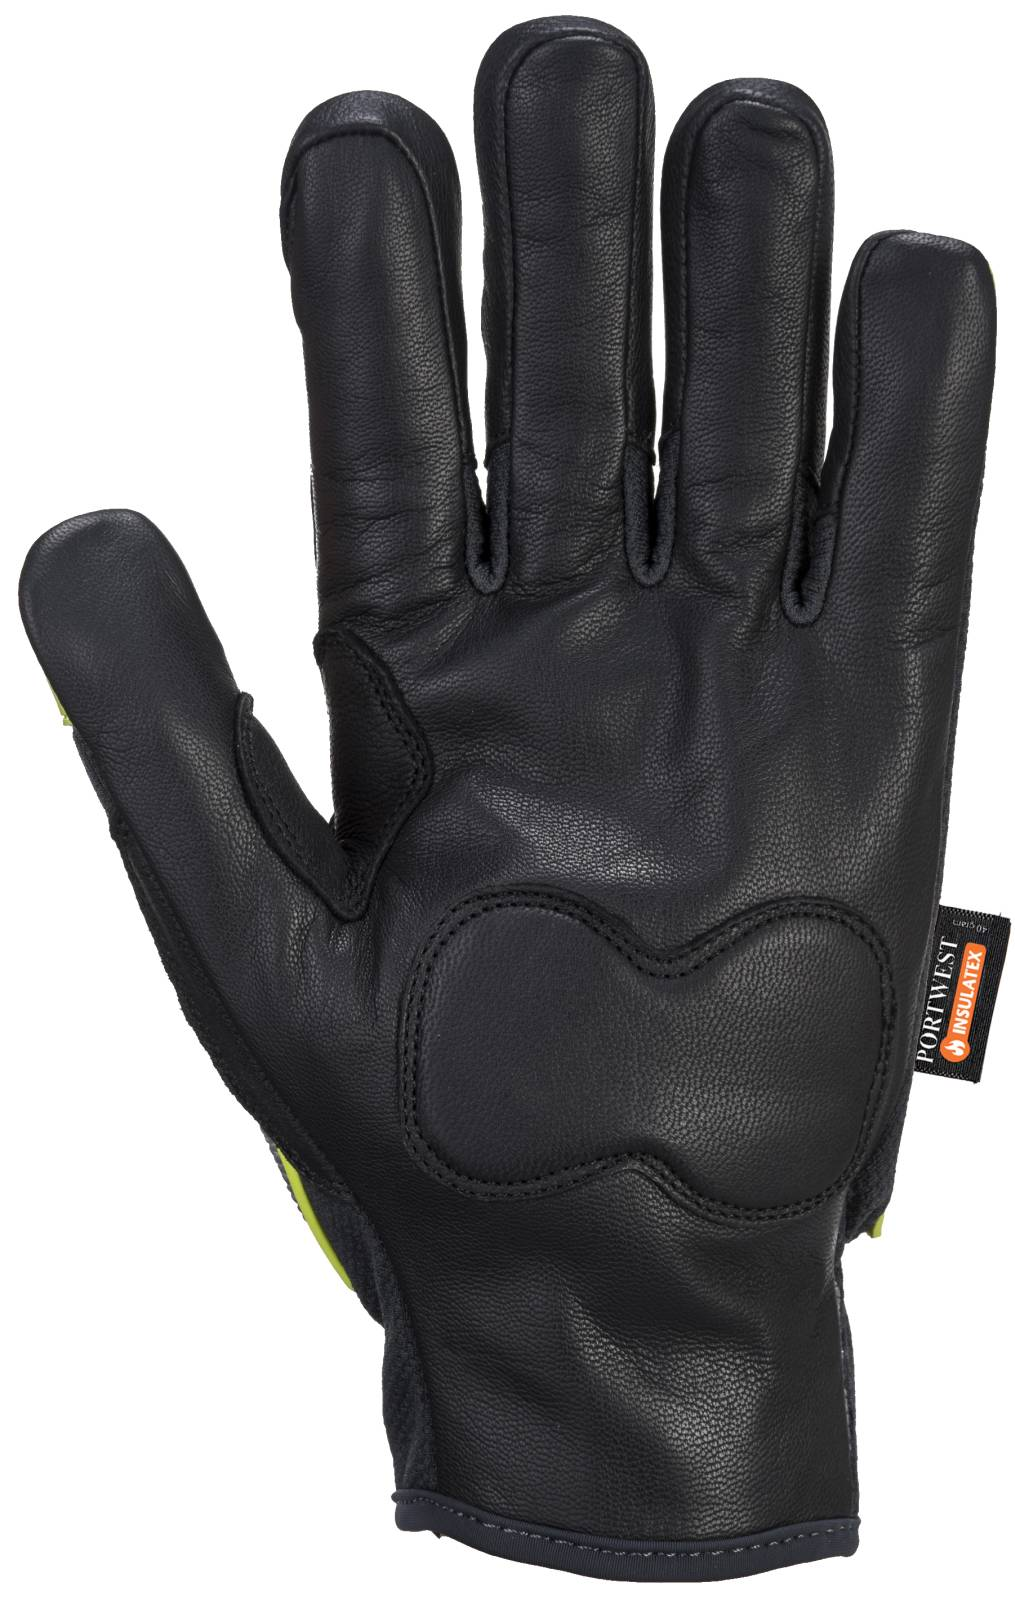 Portwest Handschoenen A762 Waterdicht geel-zwart(Y8)